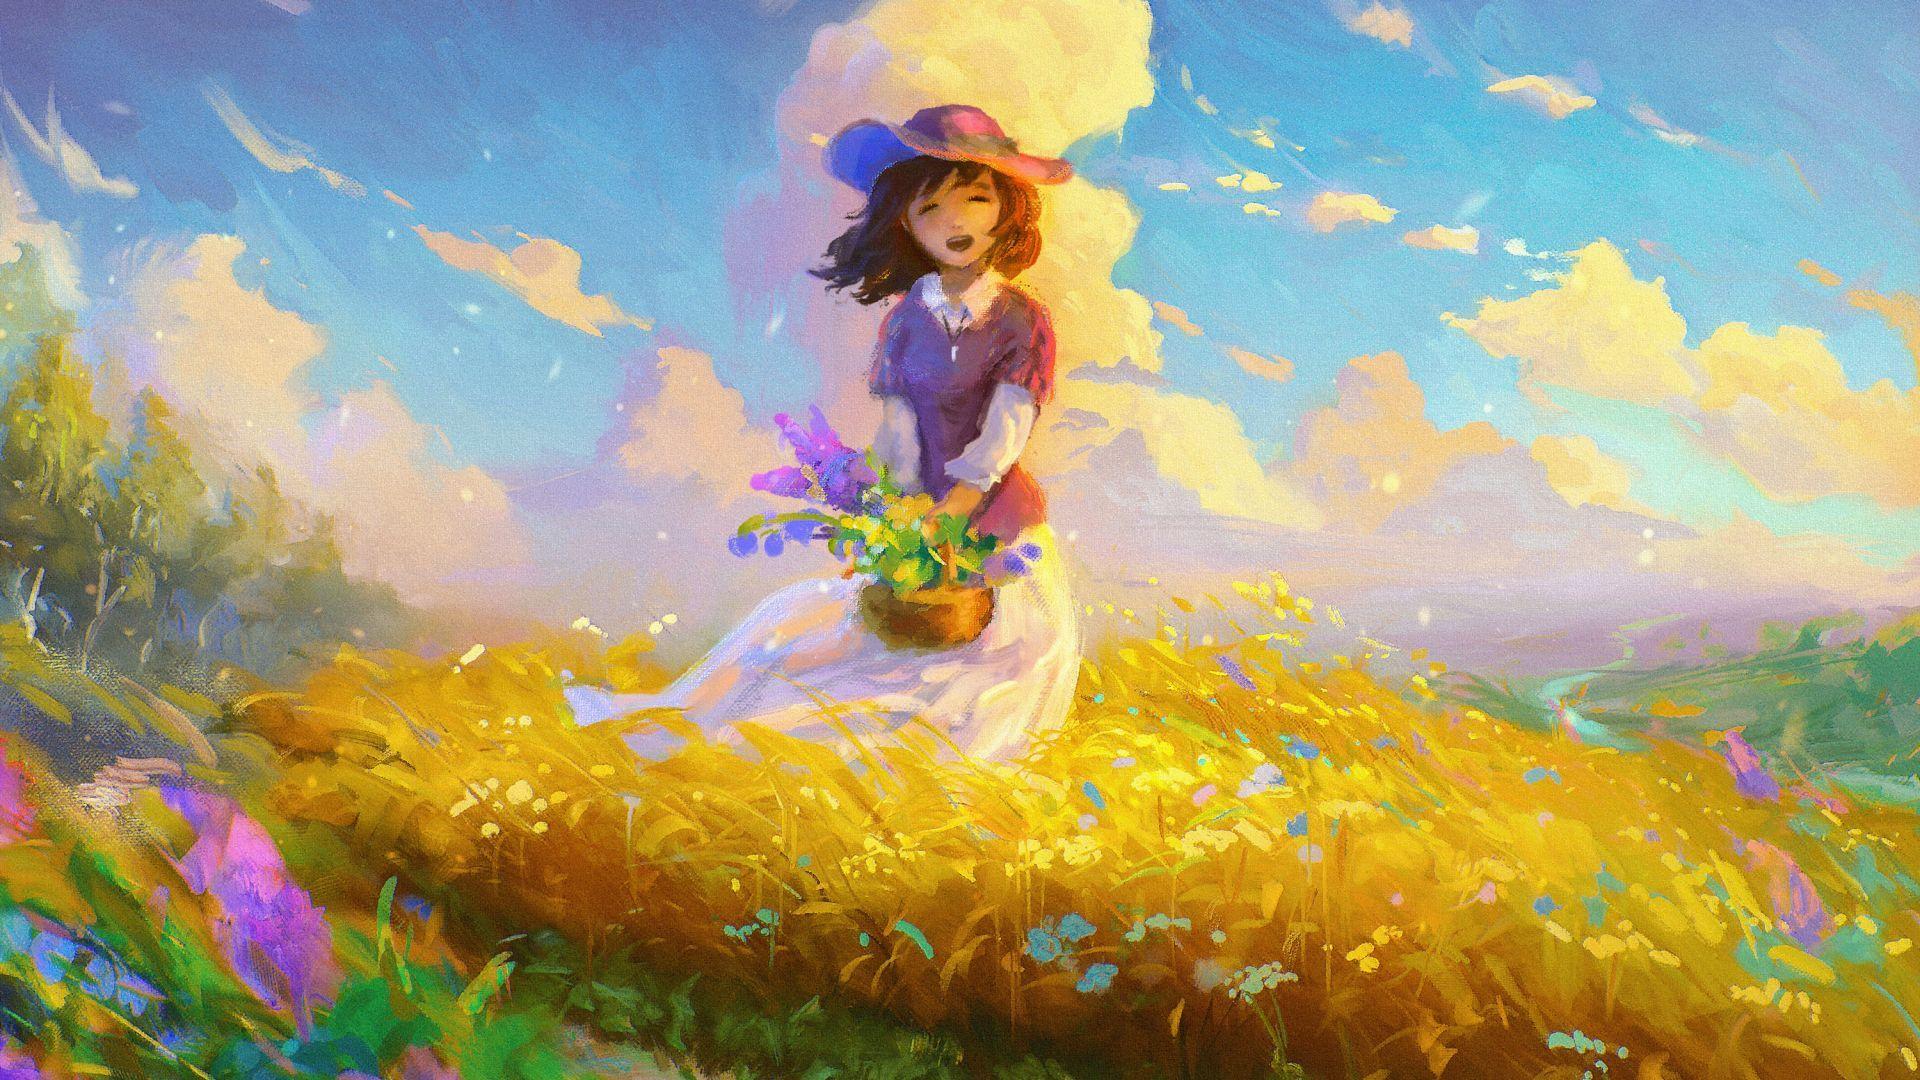 Girl, Happy mood, Spring, Digital art, HD アニメの風景, 插画, 画